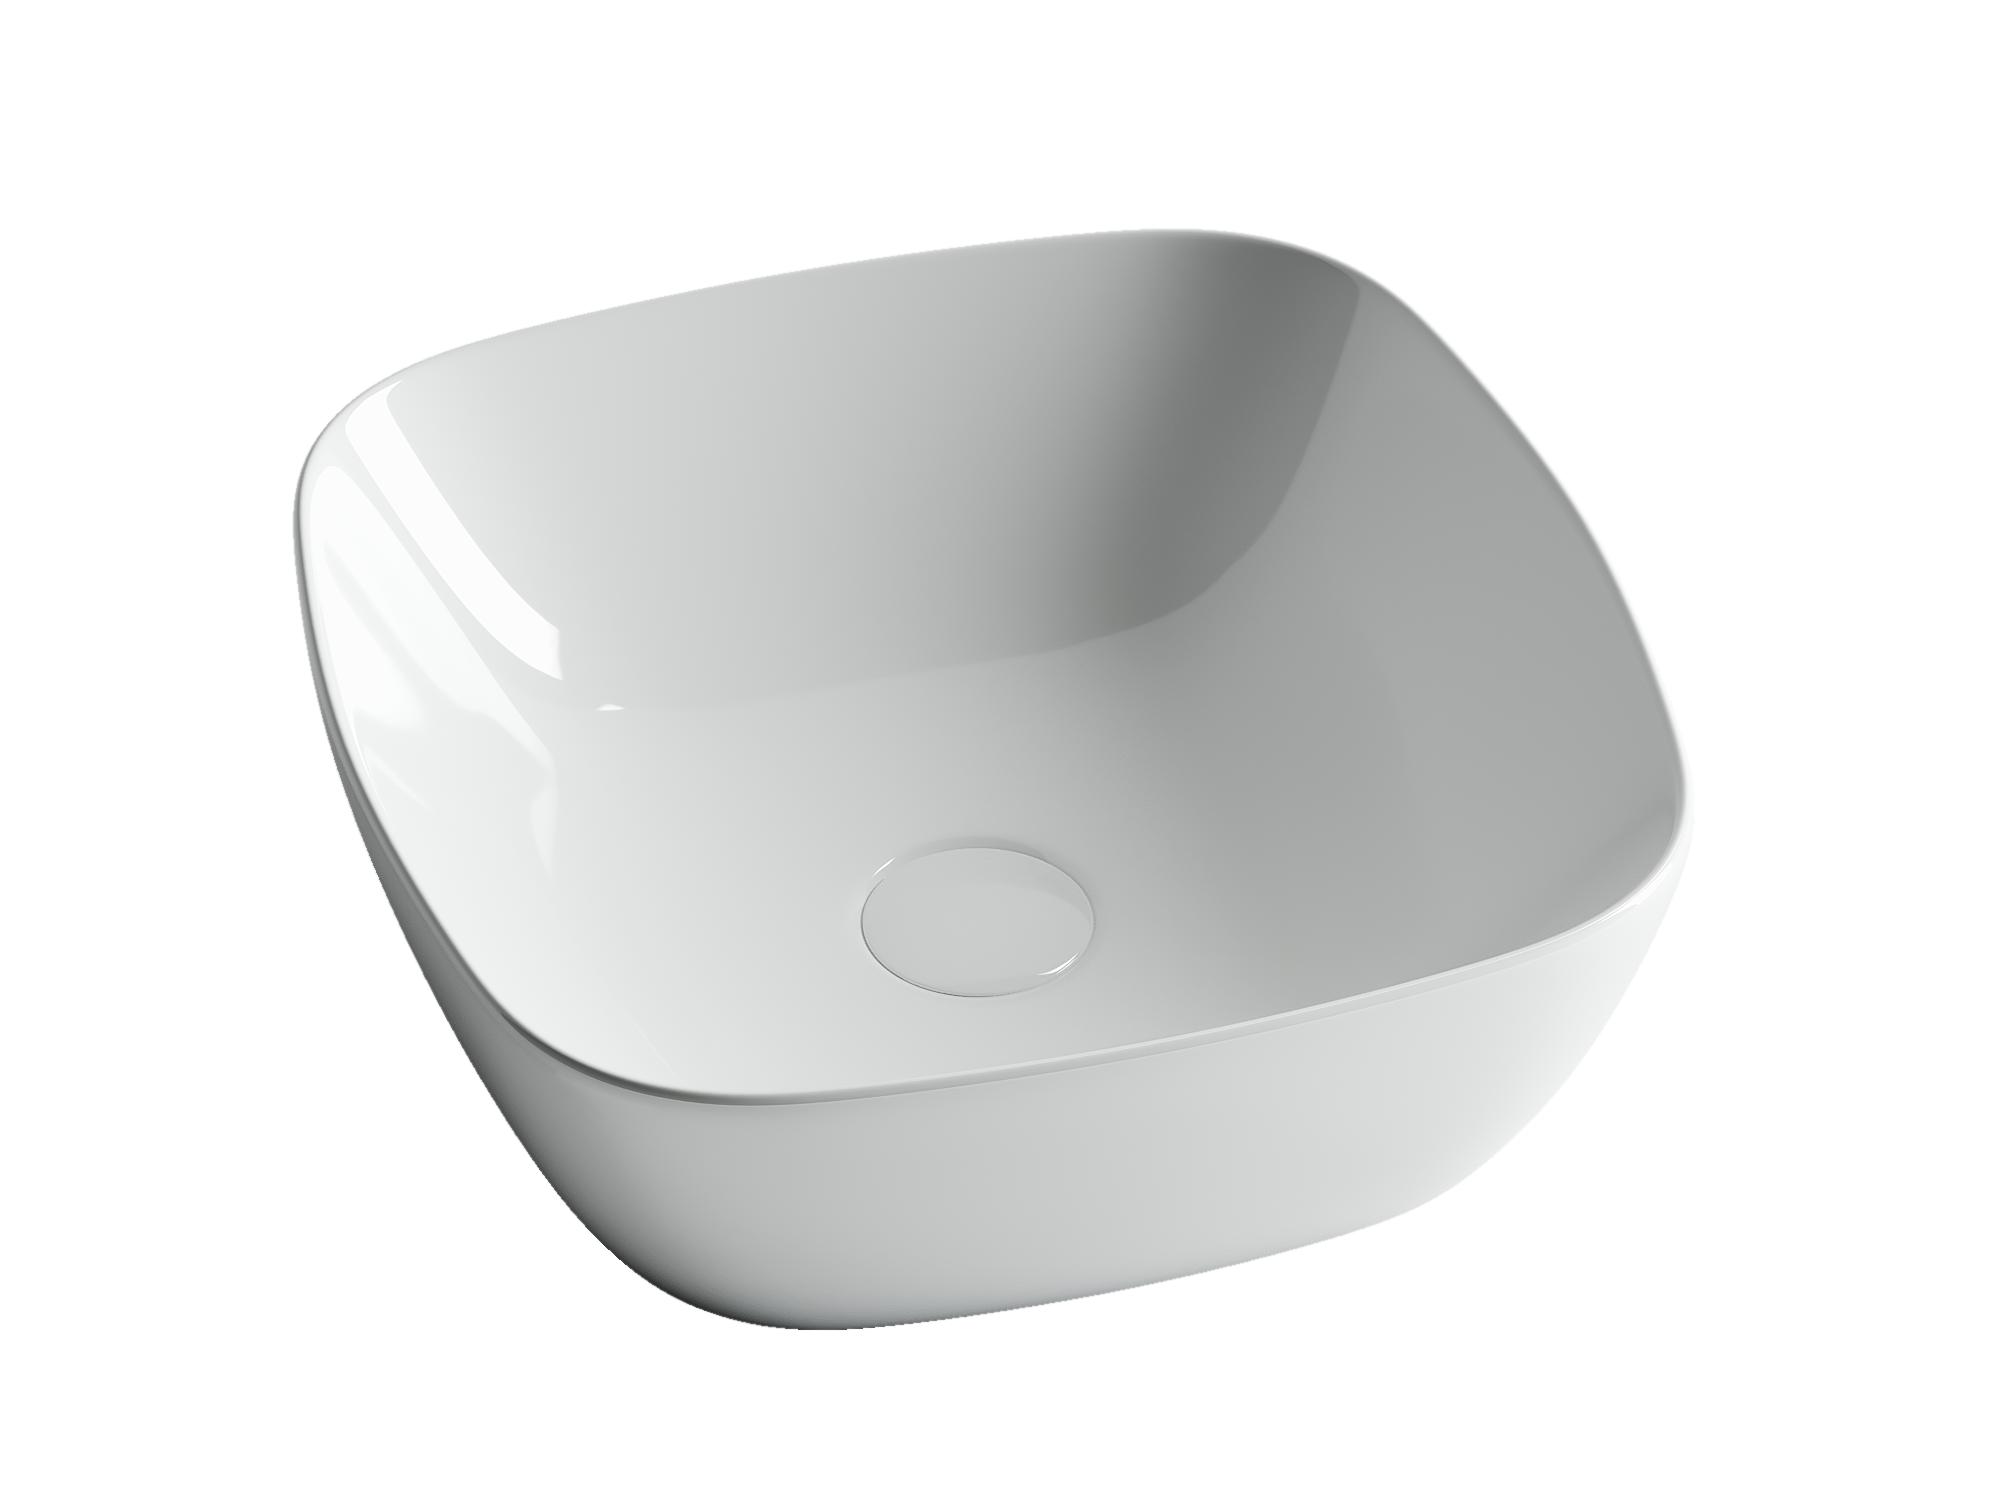 Раковина чаша накладная квадратная Ceramica Nova Element CN5006 400x400x140мм